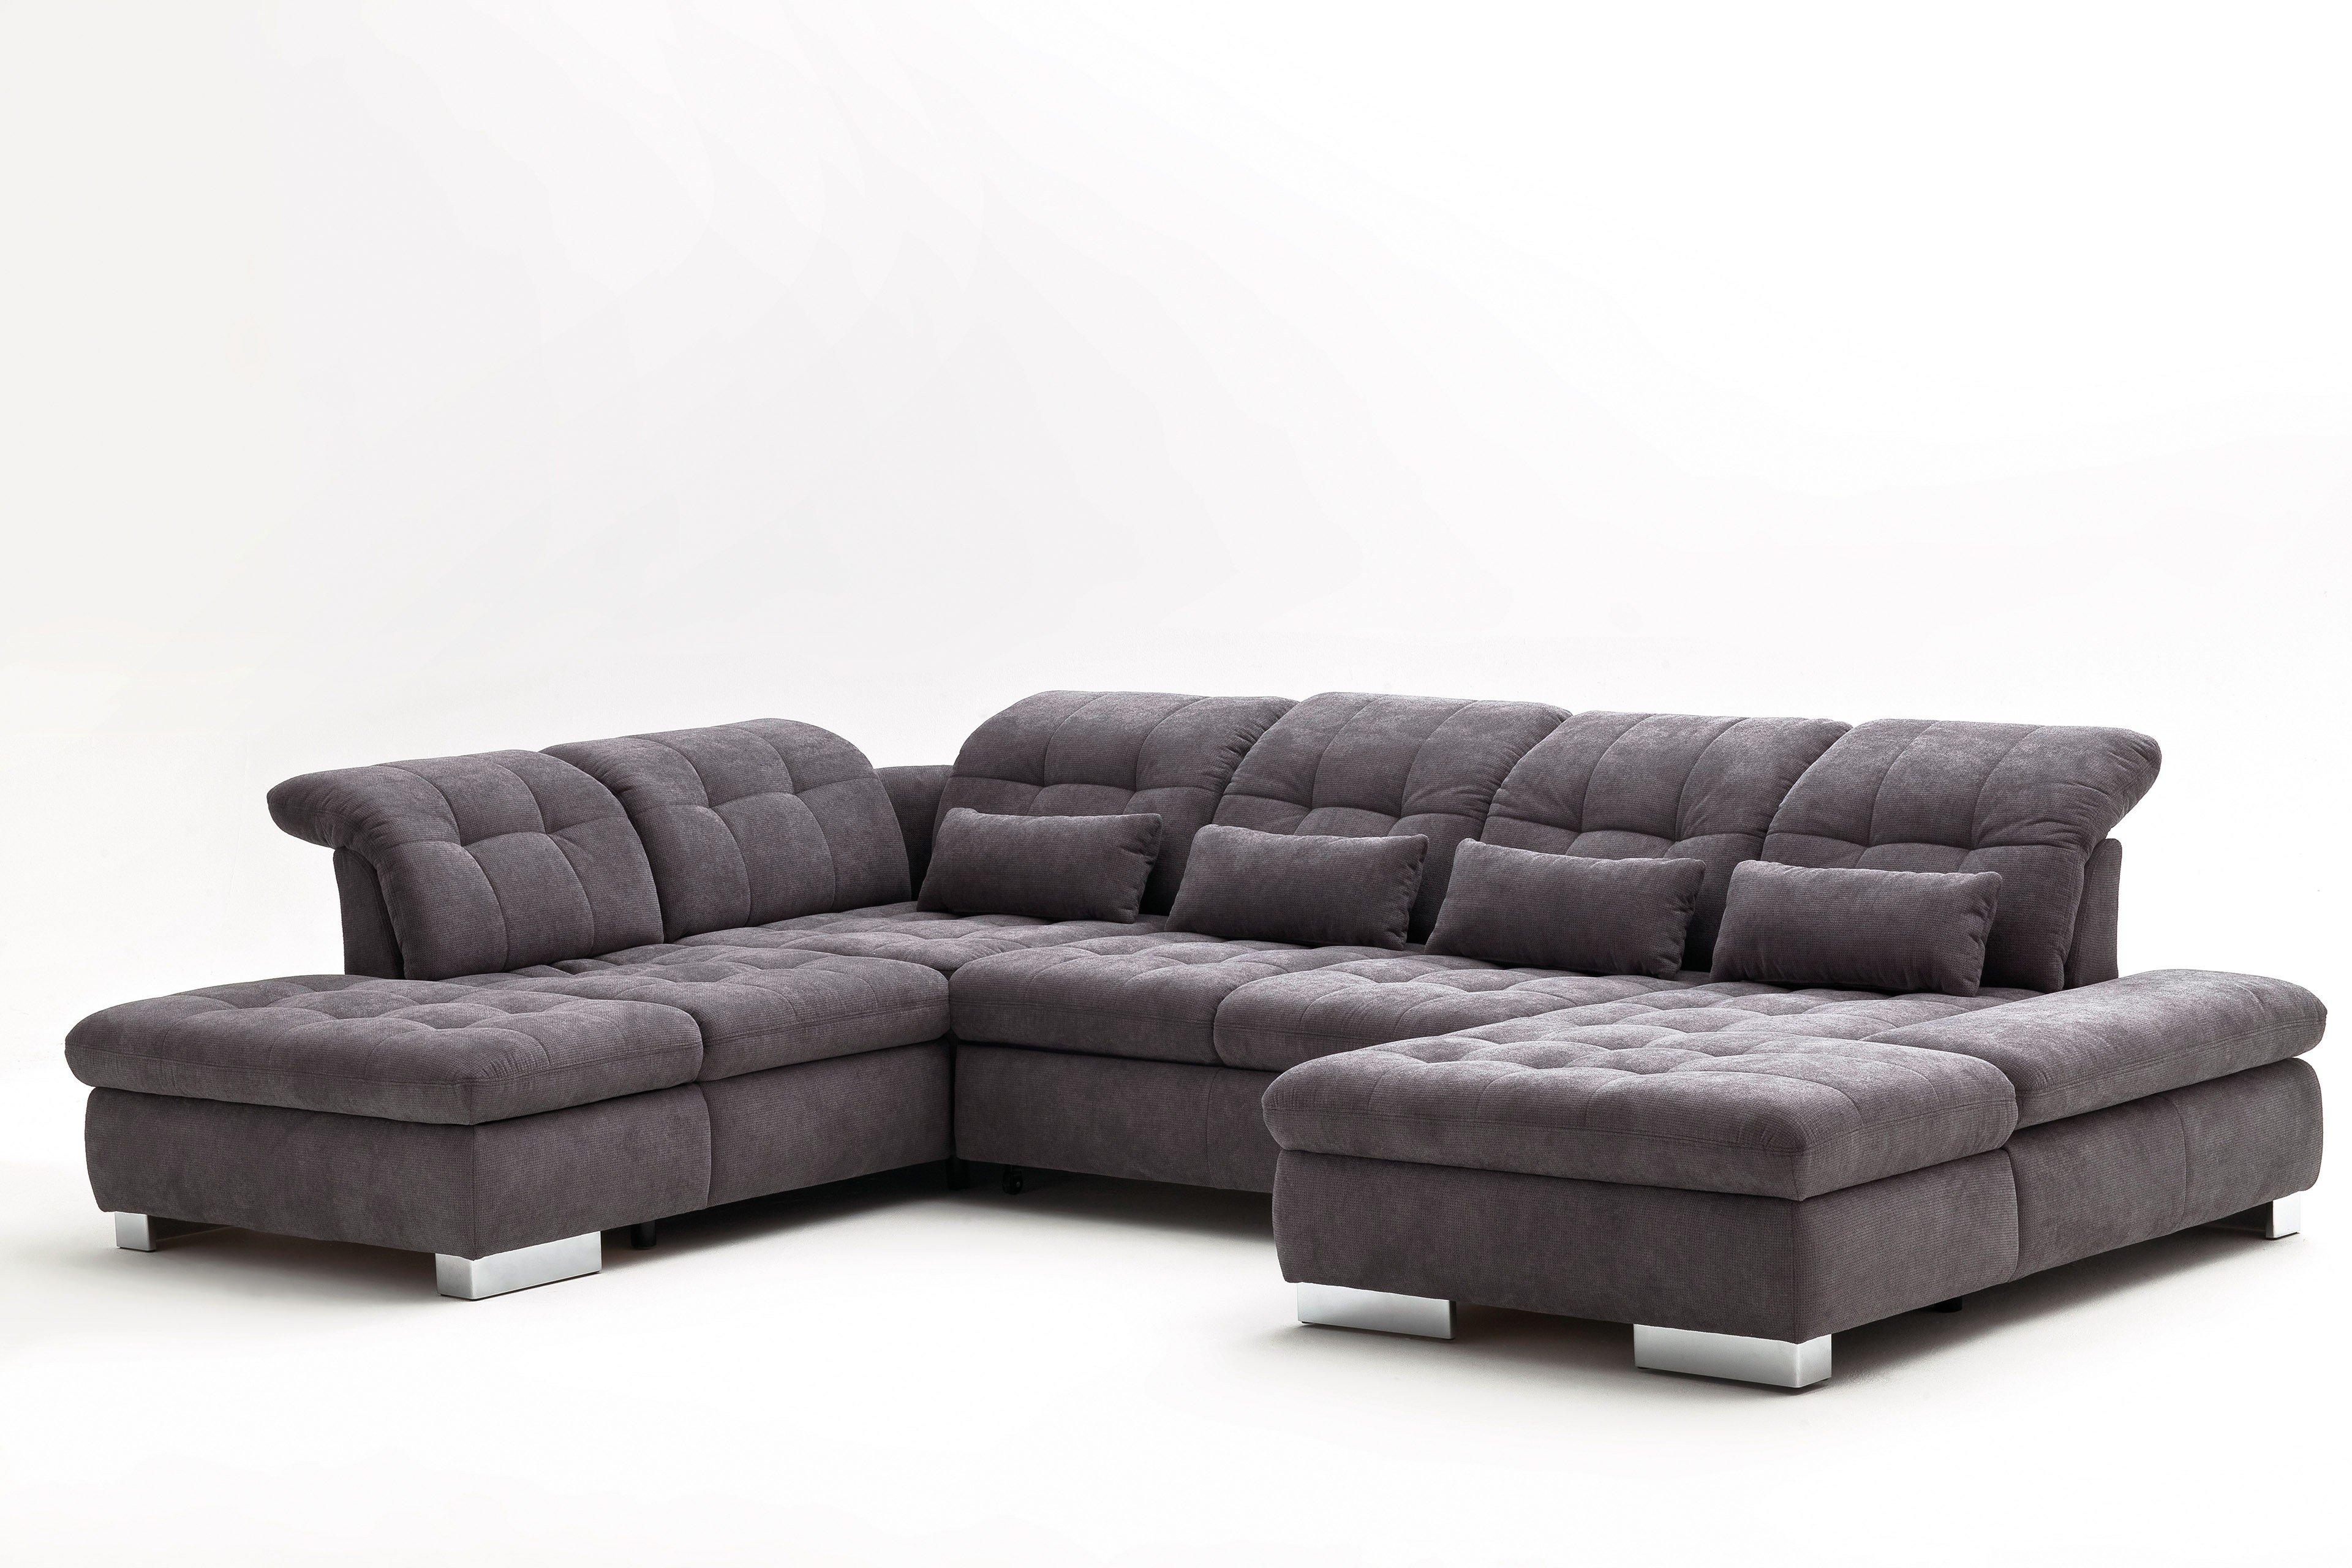 Poco Polstermöbel Bari Sofa in U-Form grau   Möbel Letz ...